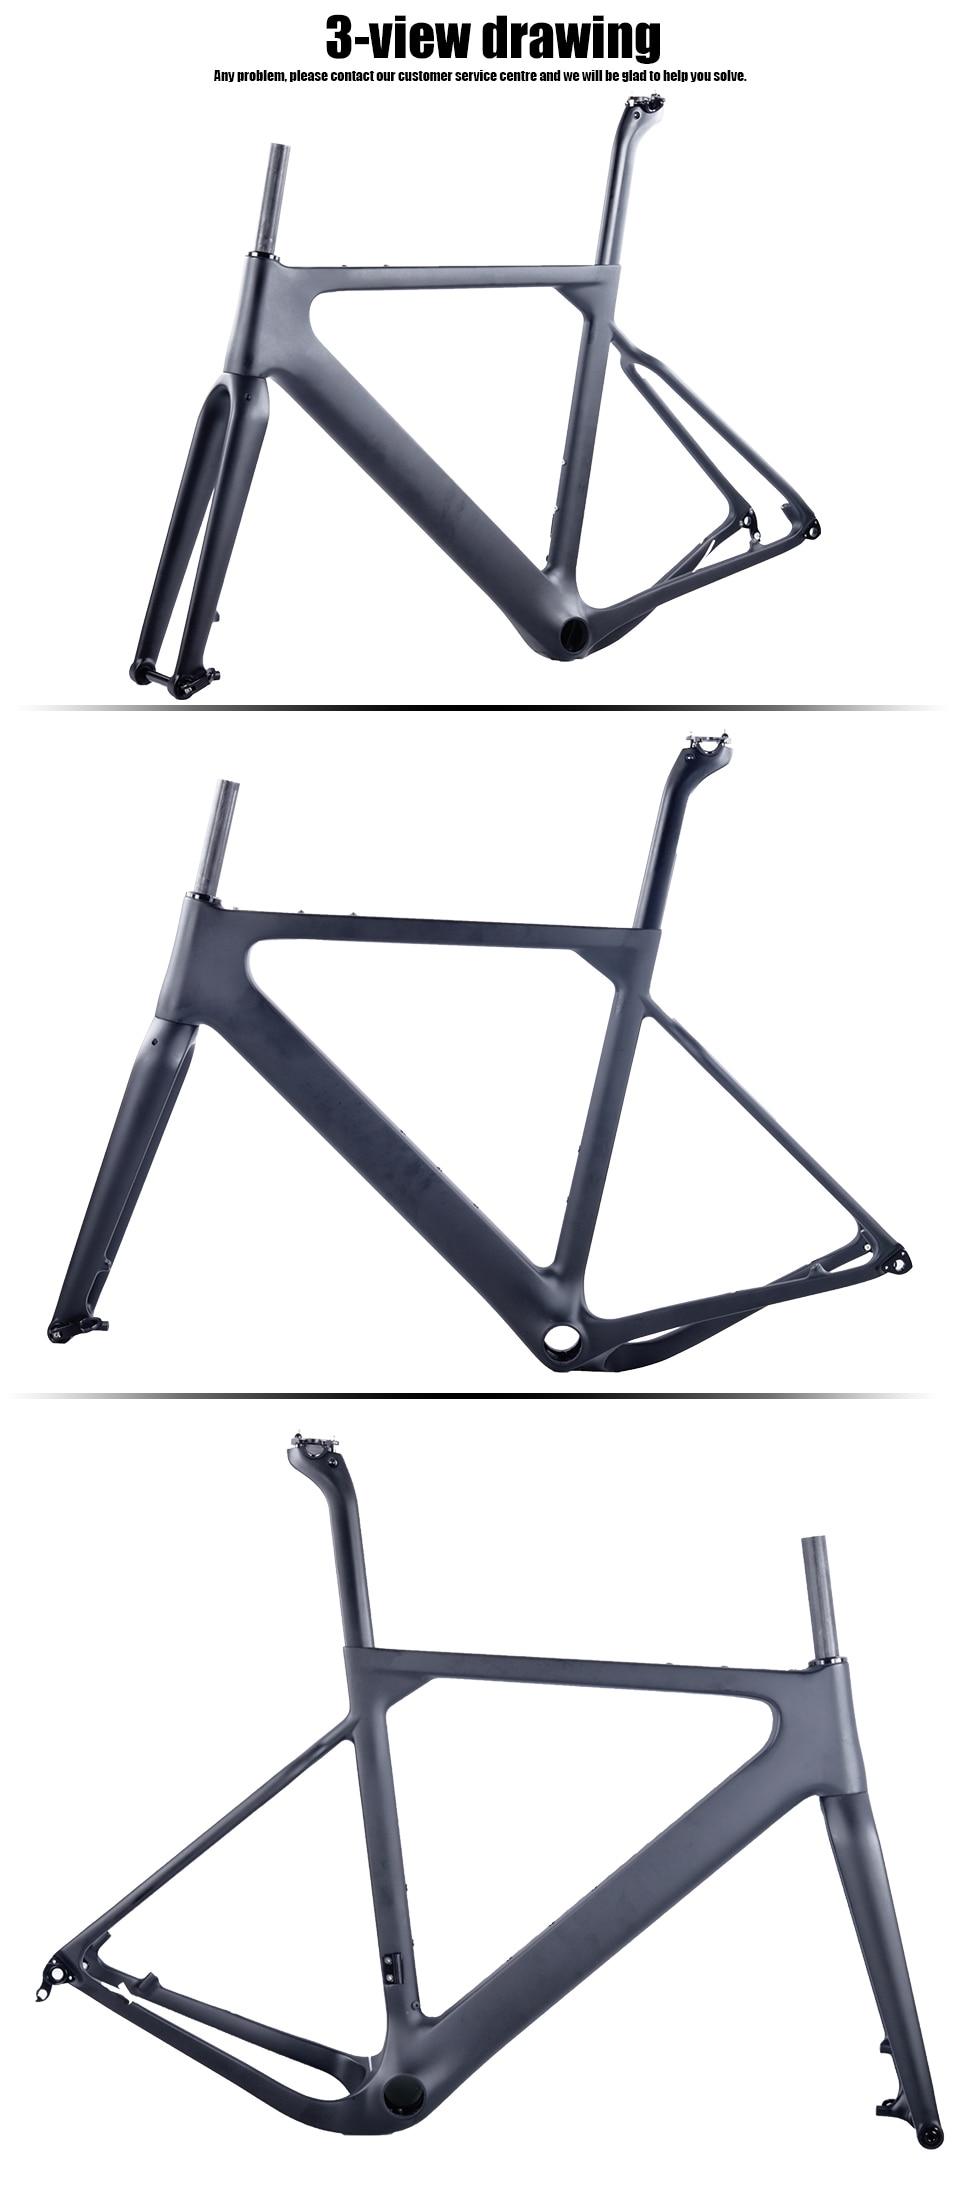 HTB1IHNwKv1TBuNjy0Fjq6yjyXXai - 2018 New Cyclocross Frame Aero Road or Gravel Bike Frame S/M/L size Disc Bike Carbon frameset QR or thru axle